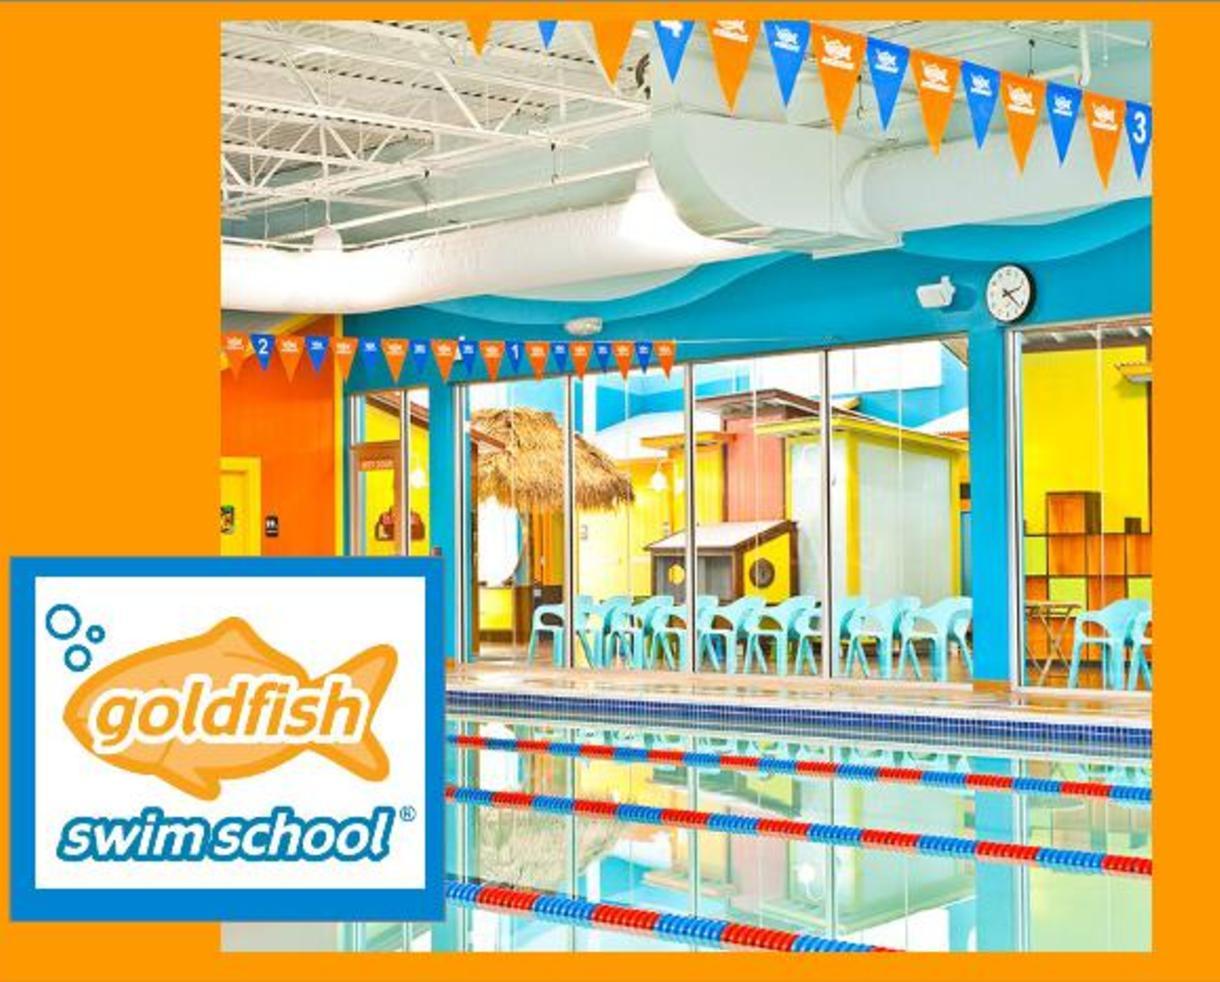 $120 for Six Swim Lessons at Goldfish Swim School in Columbia - $25 Deposit Paid Now (29% Off!)